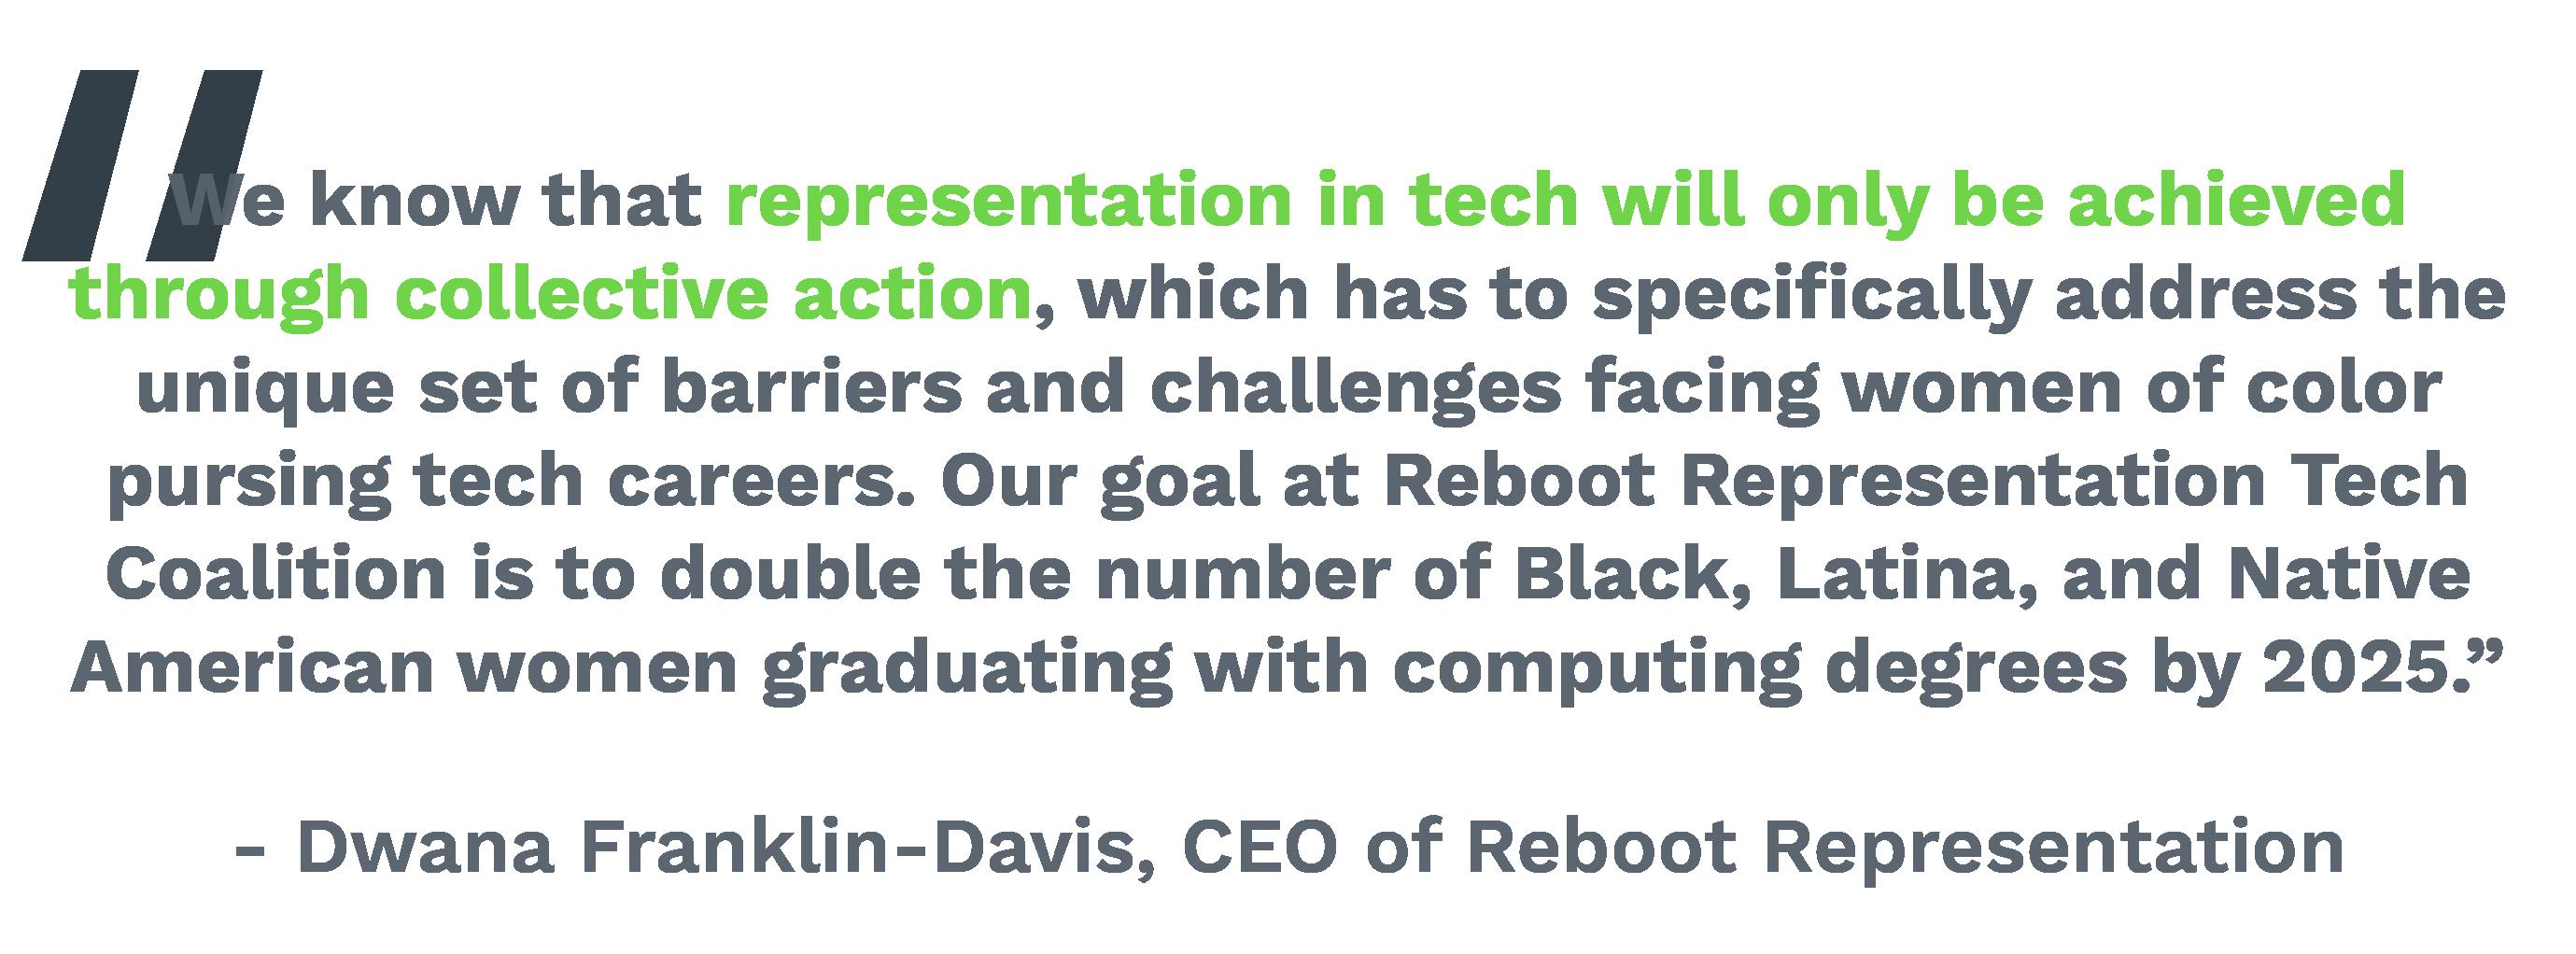 diversity+tech+organizations_2